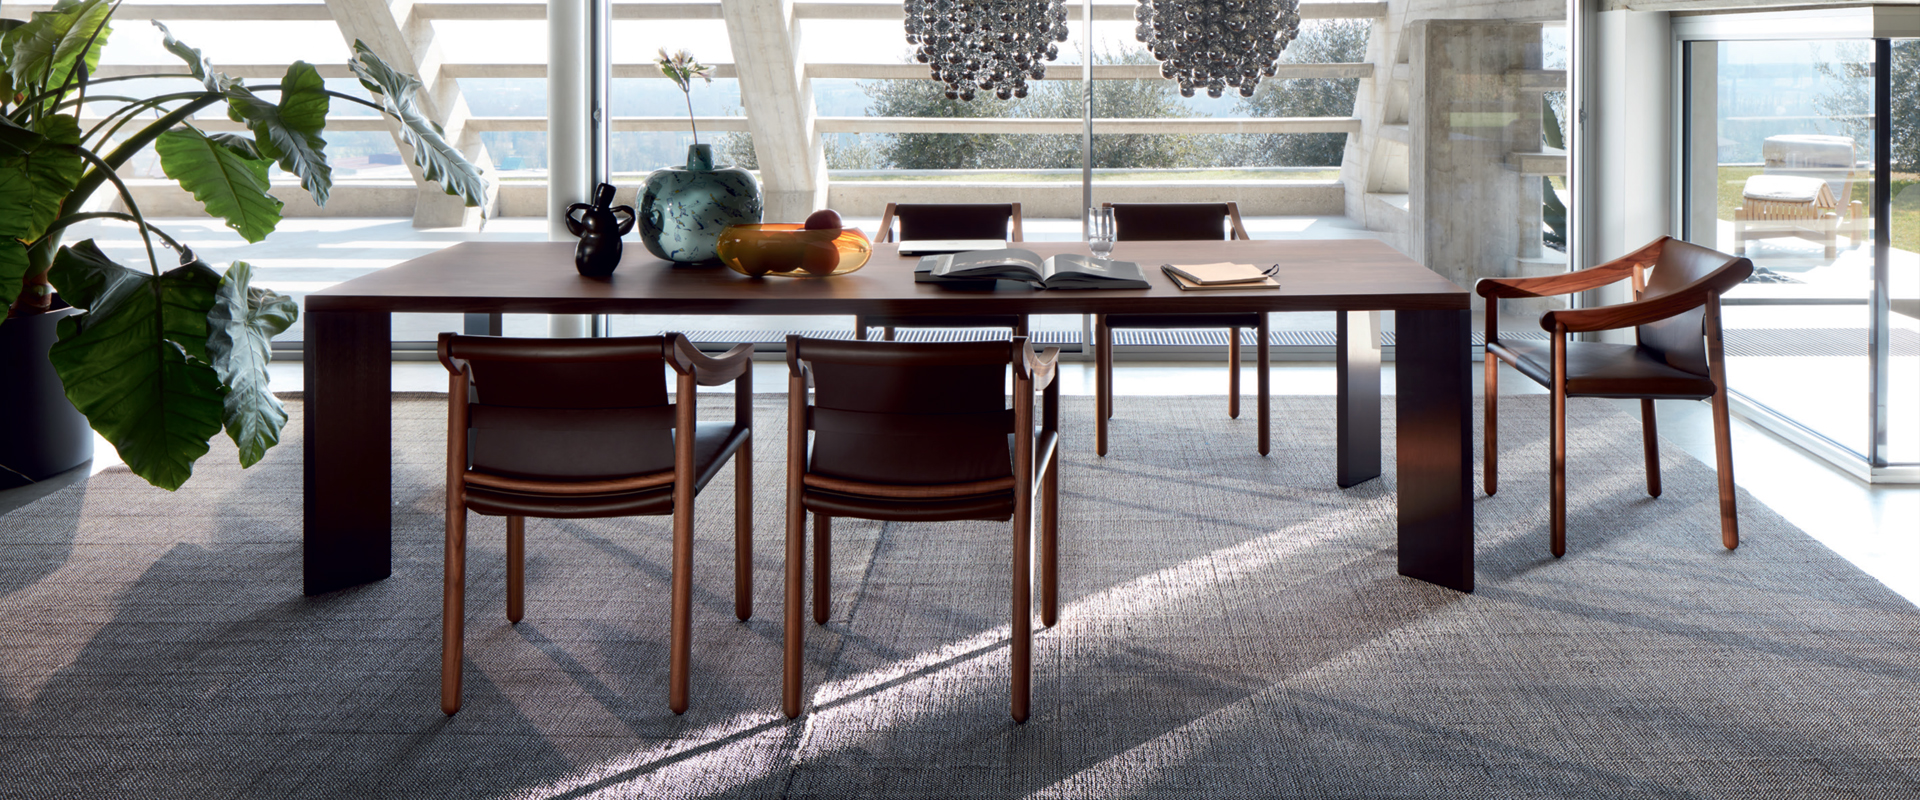 905, una sedia moderna con un grande patrimonio